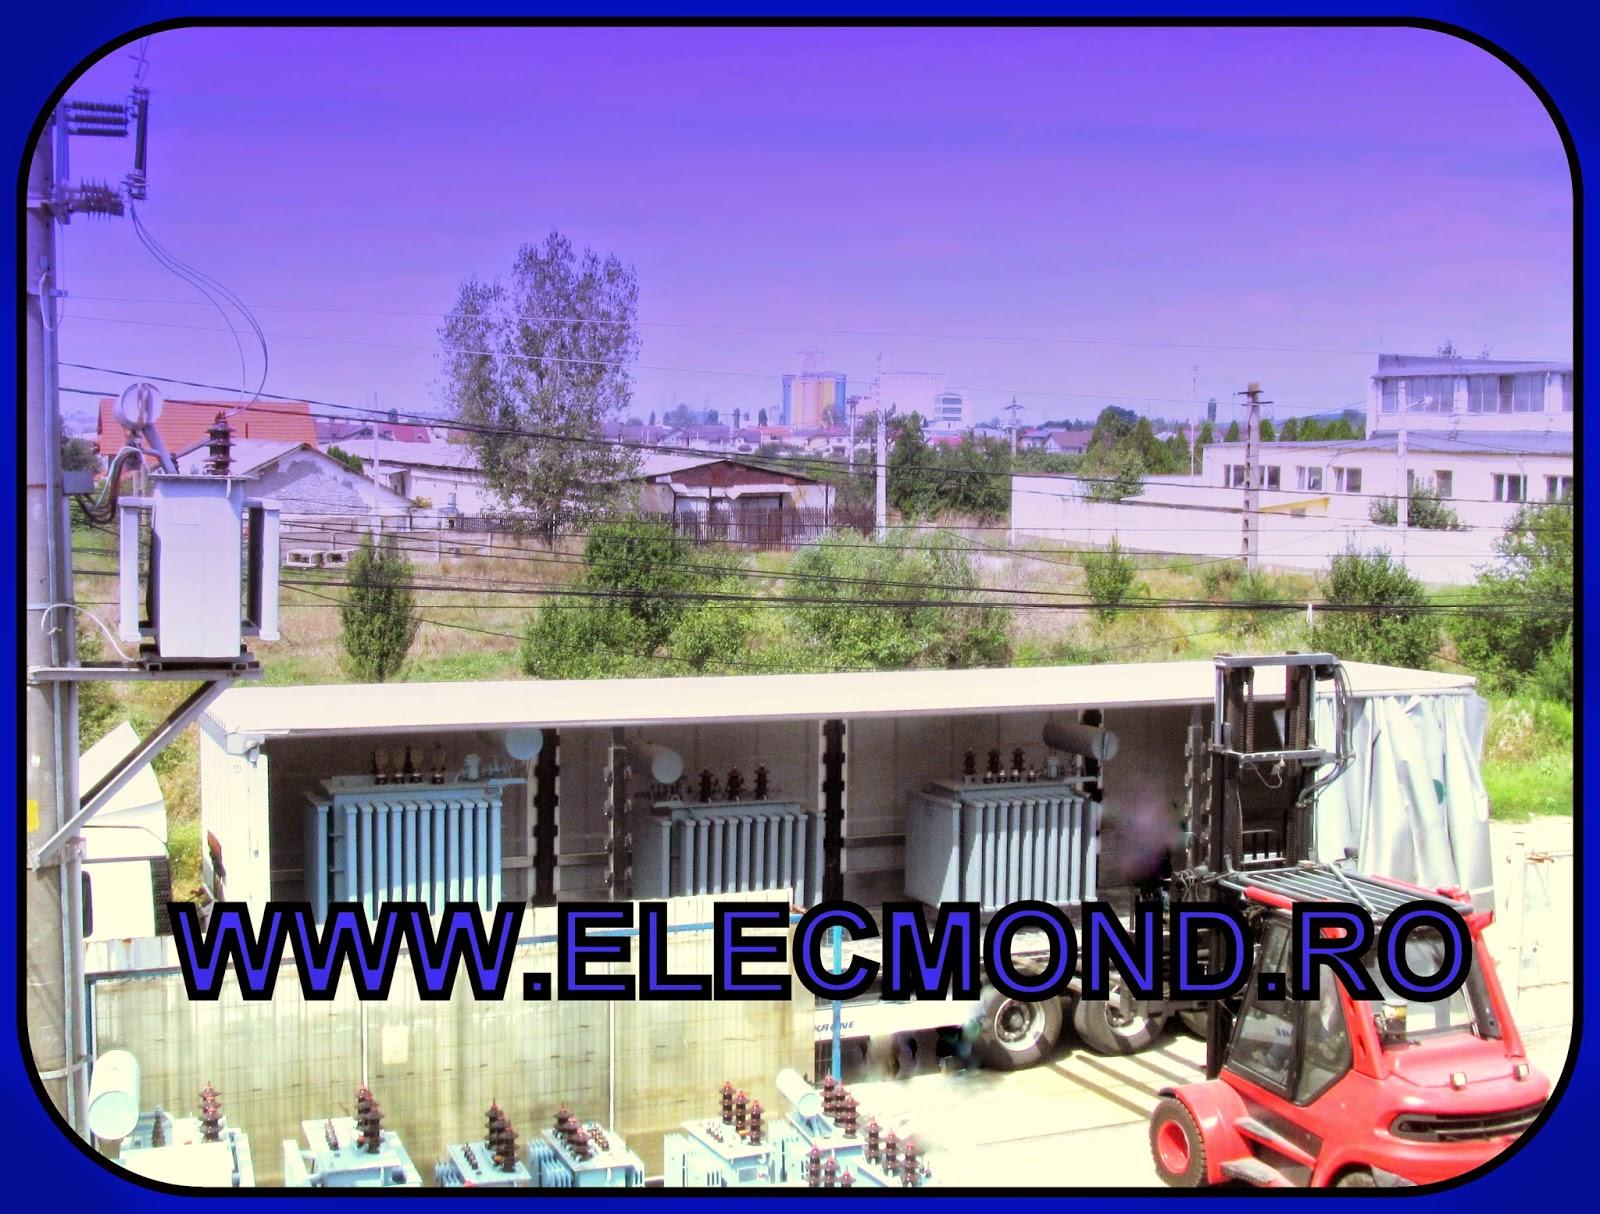 Transformatoare 2000 kVA , 1000 kVA , 1000 kVA  20/0,4kV , , elecmond blog , elecmond , transformatoare de putere , transformatoare electrice